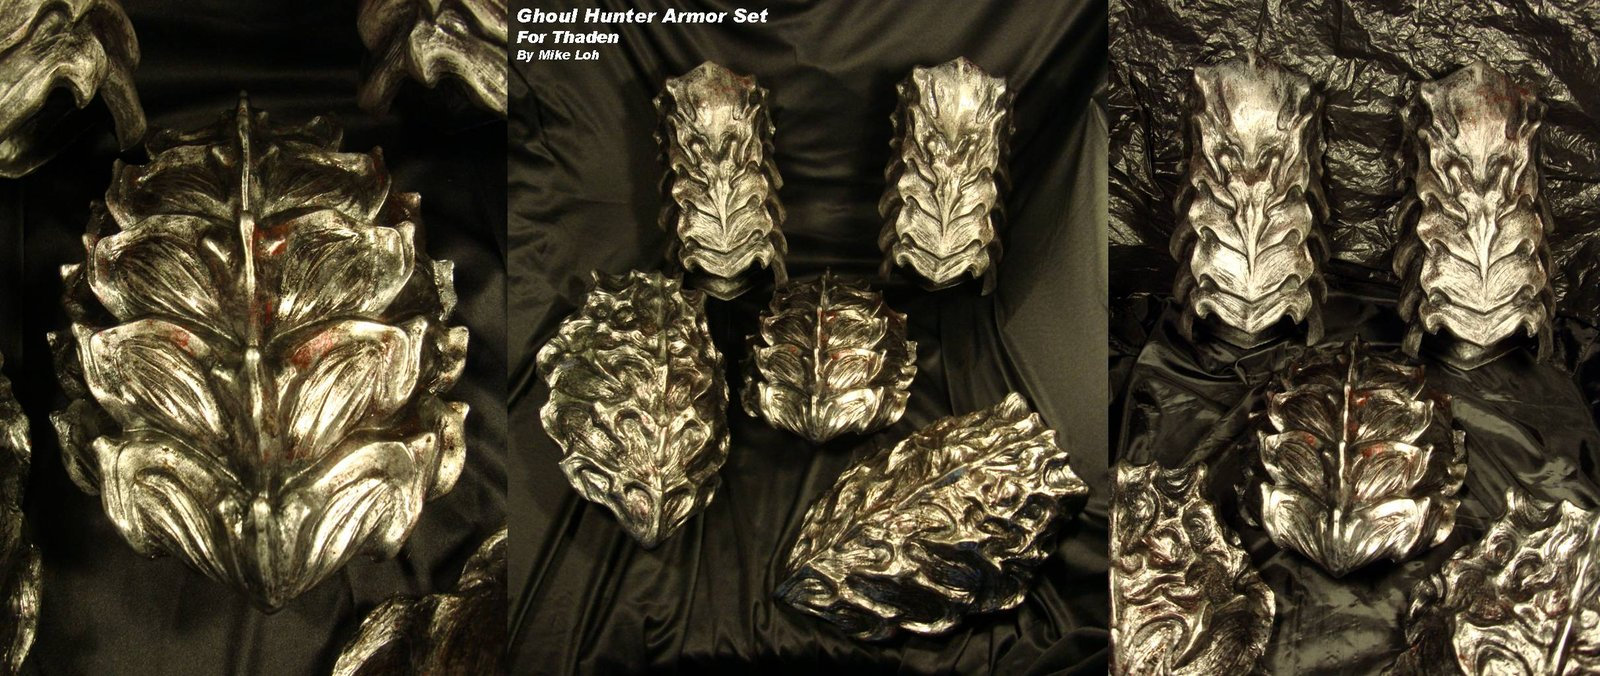 thaden_ancient_armor_set_by_michaelloh-d2xr90y.jpg